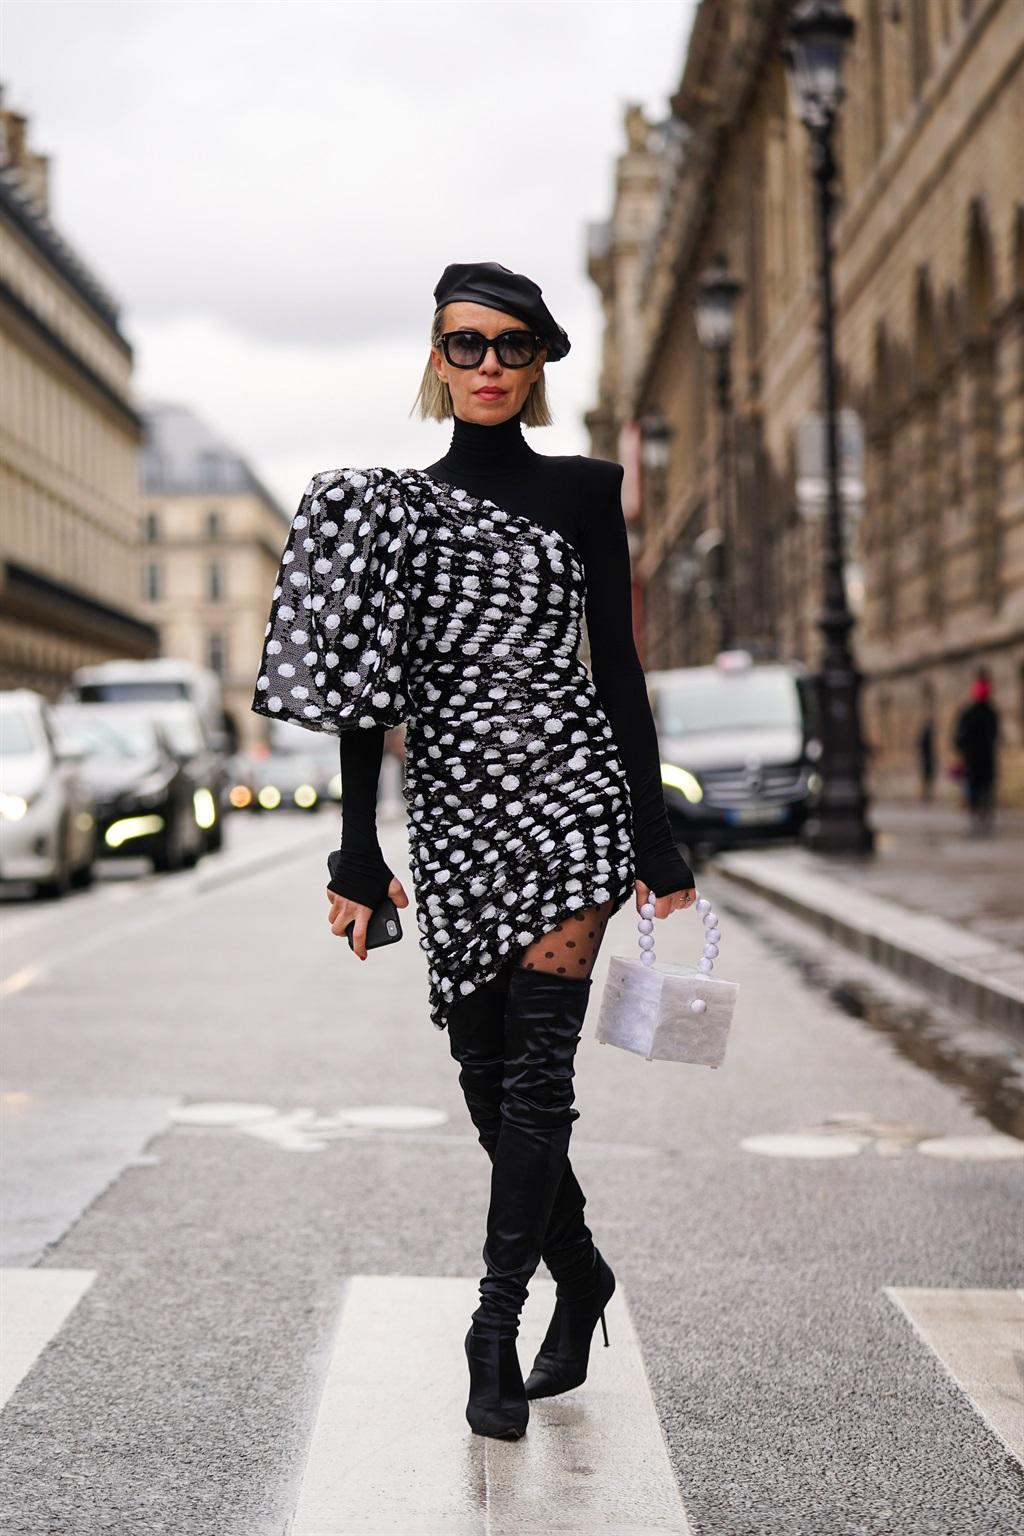 PARIS, FRANCE - JULY 07: Gabriella Berdugo wears a